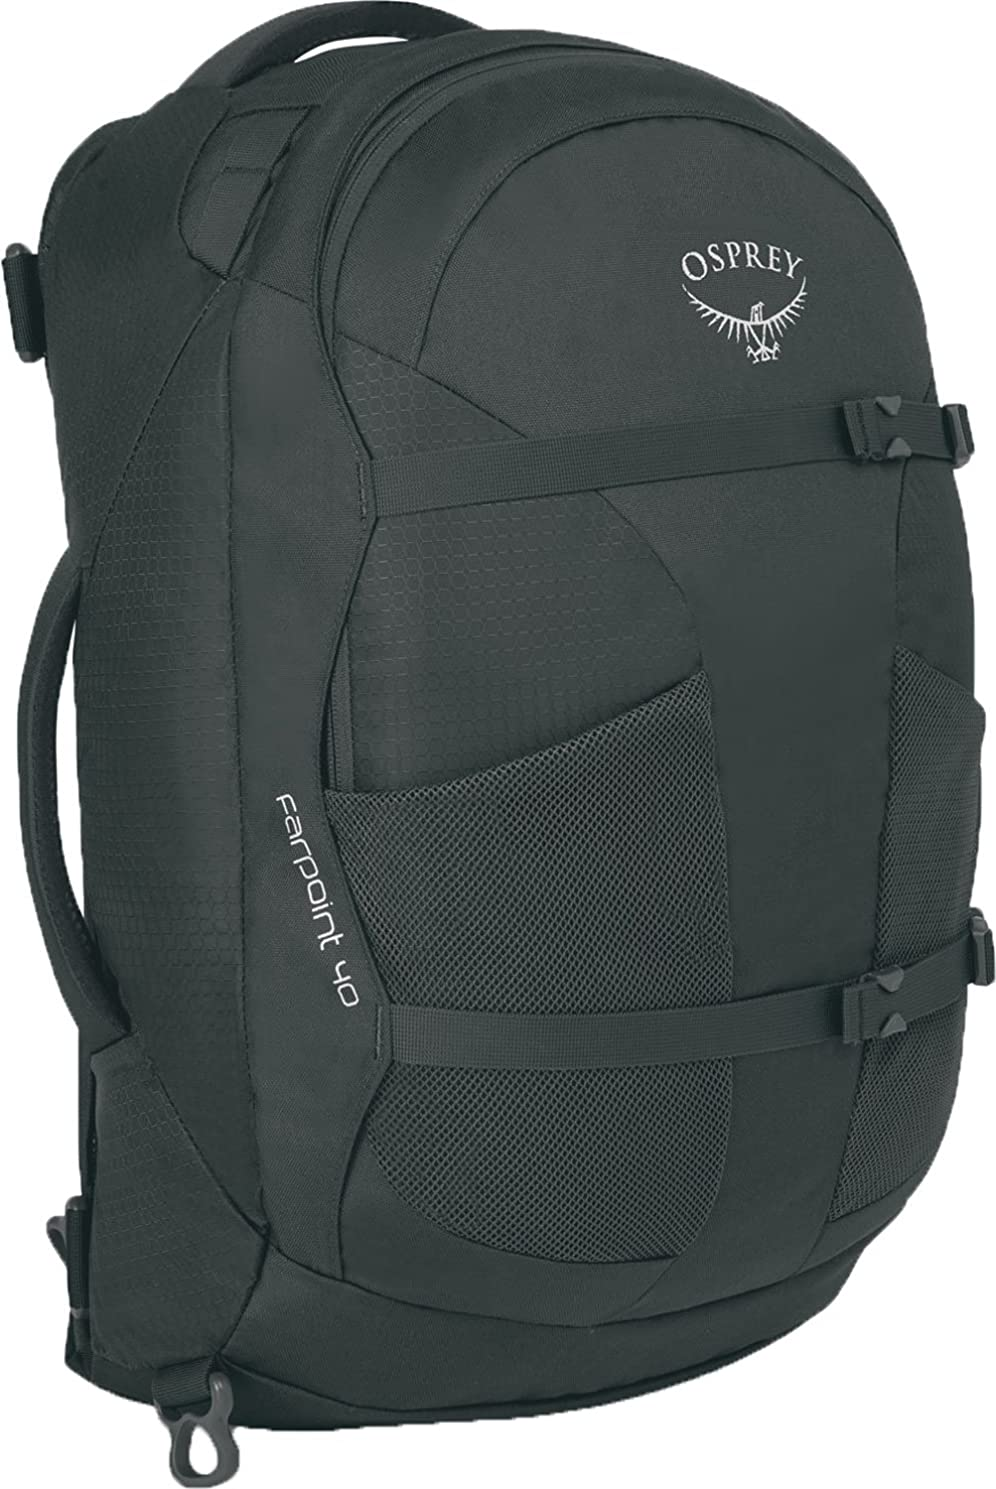 Osprey Packs Farpoint 40 Travel Backpack